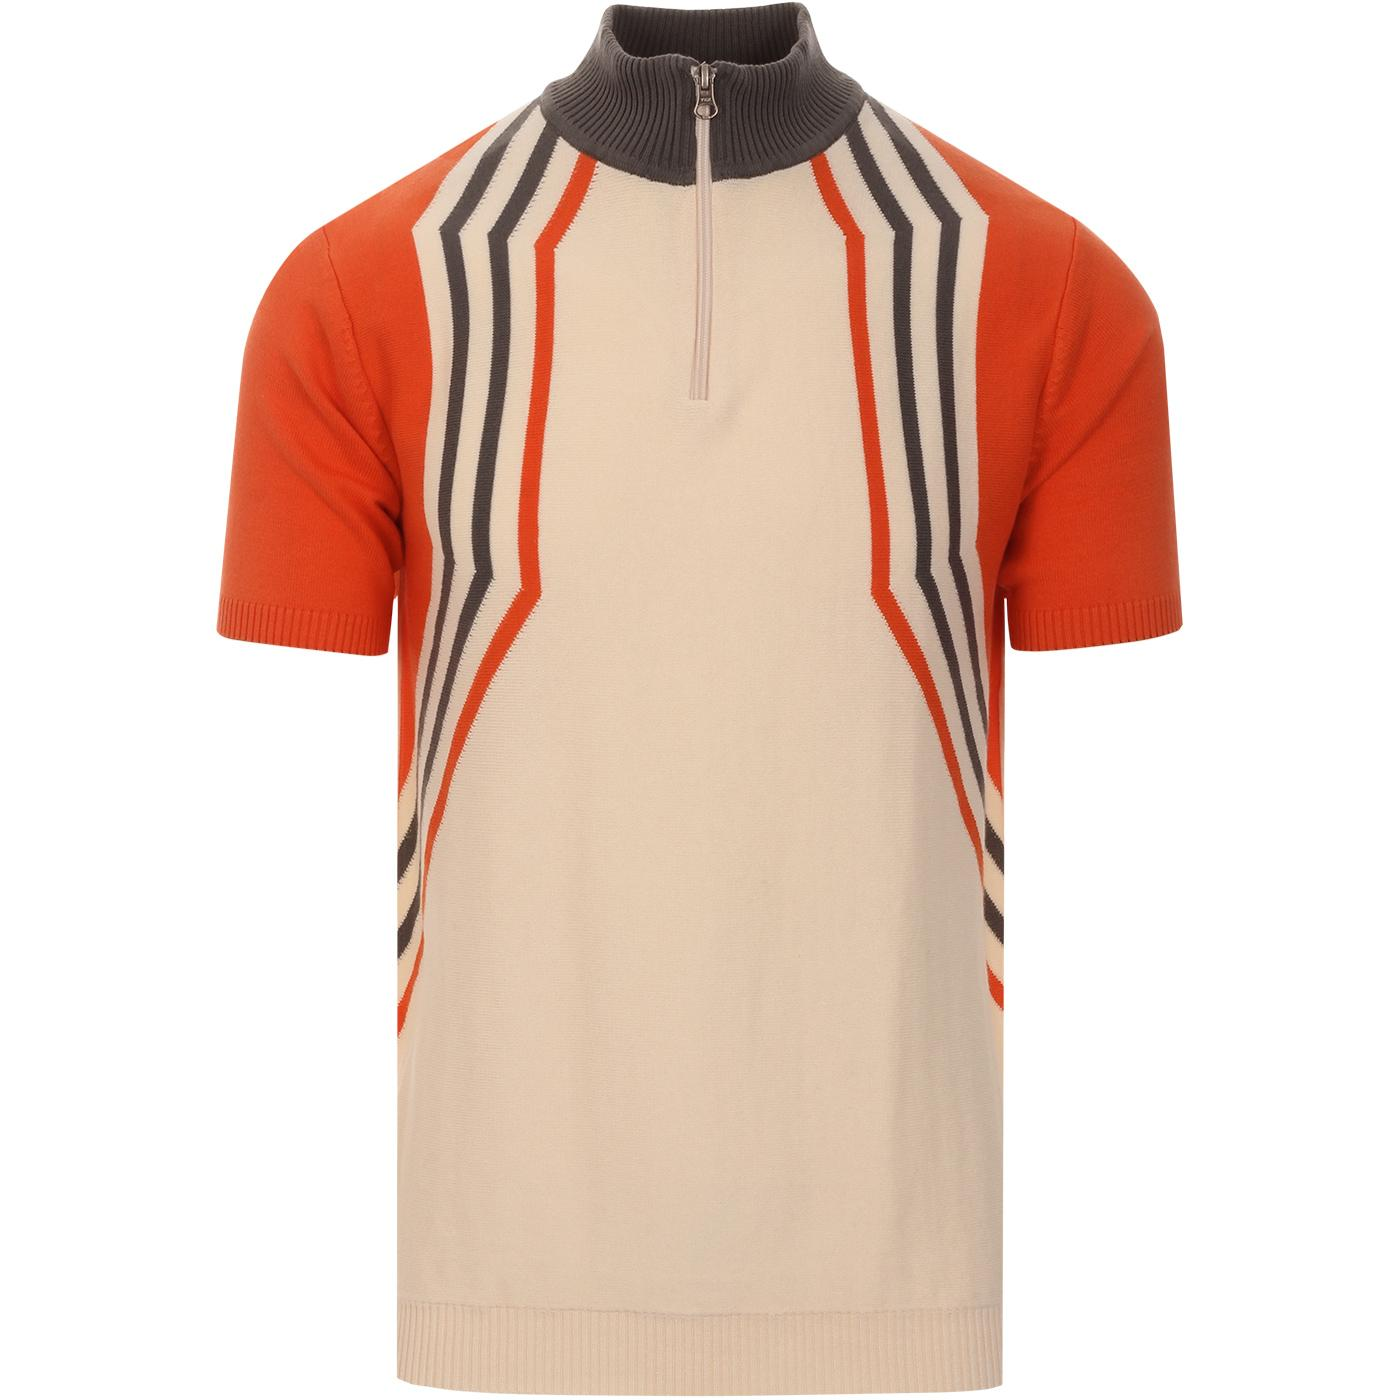 madcap england mens slipstream hex stripe half zip cycling short sleeve top eggnogg orange